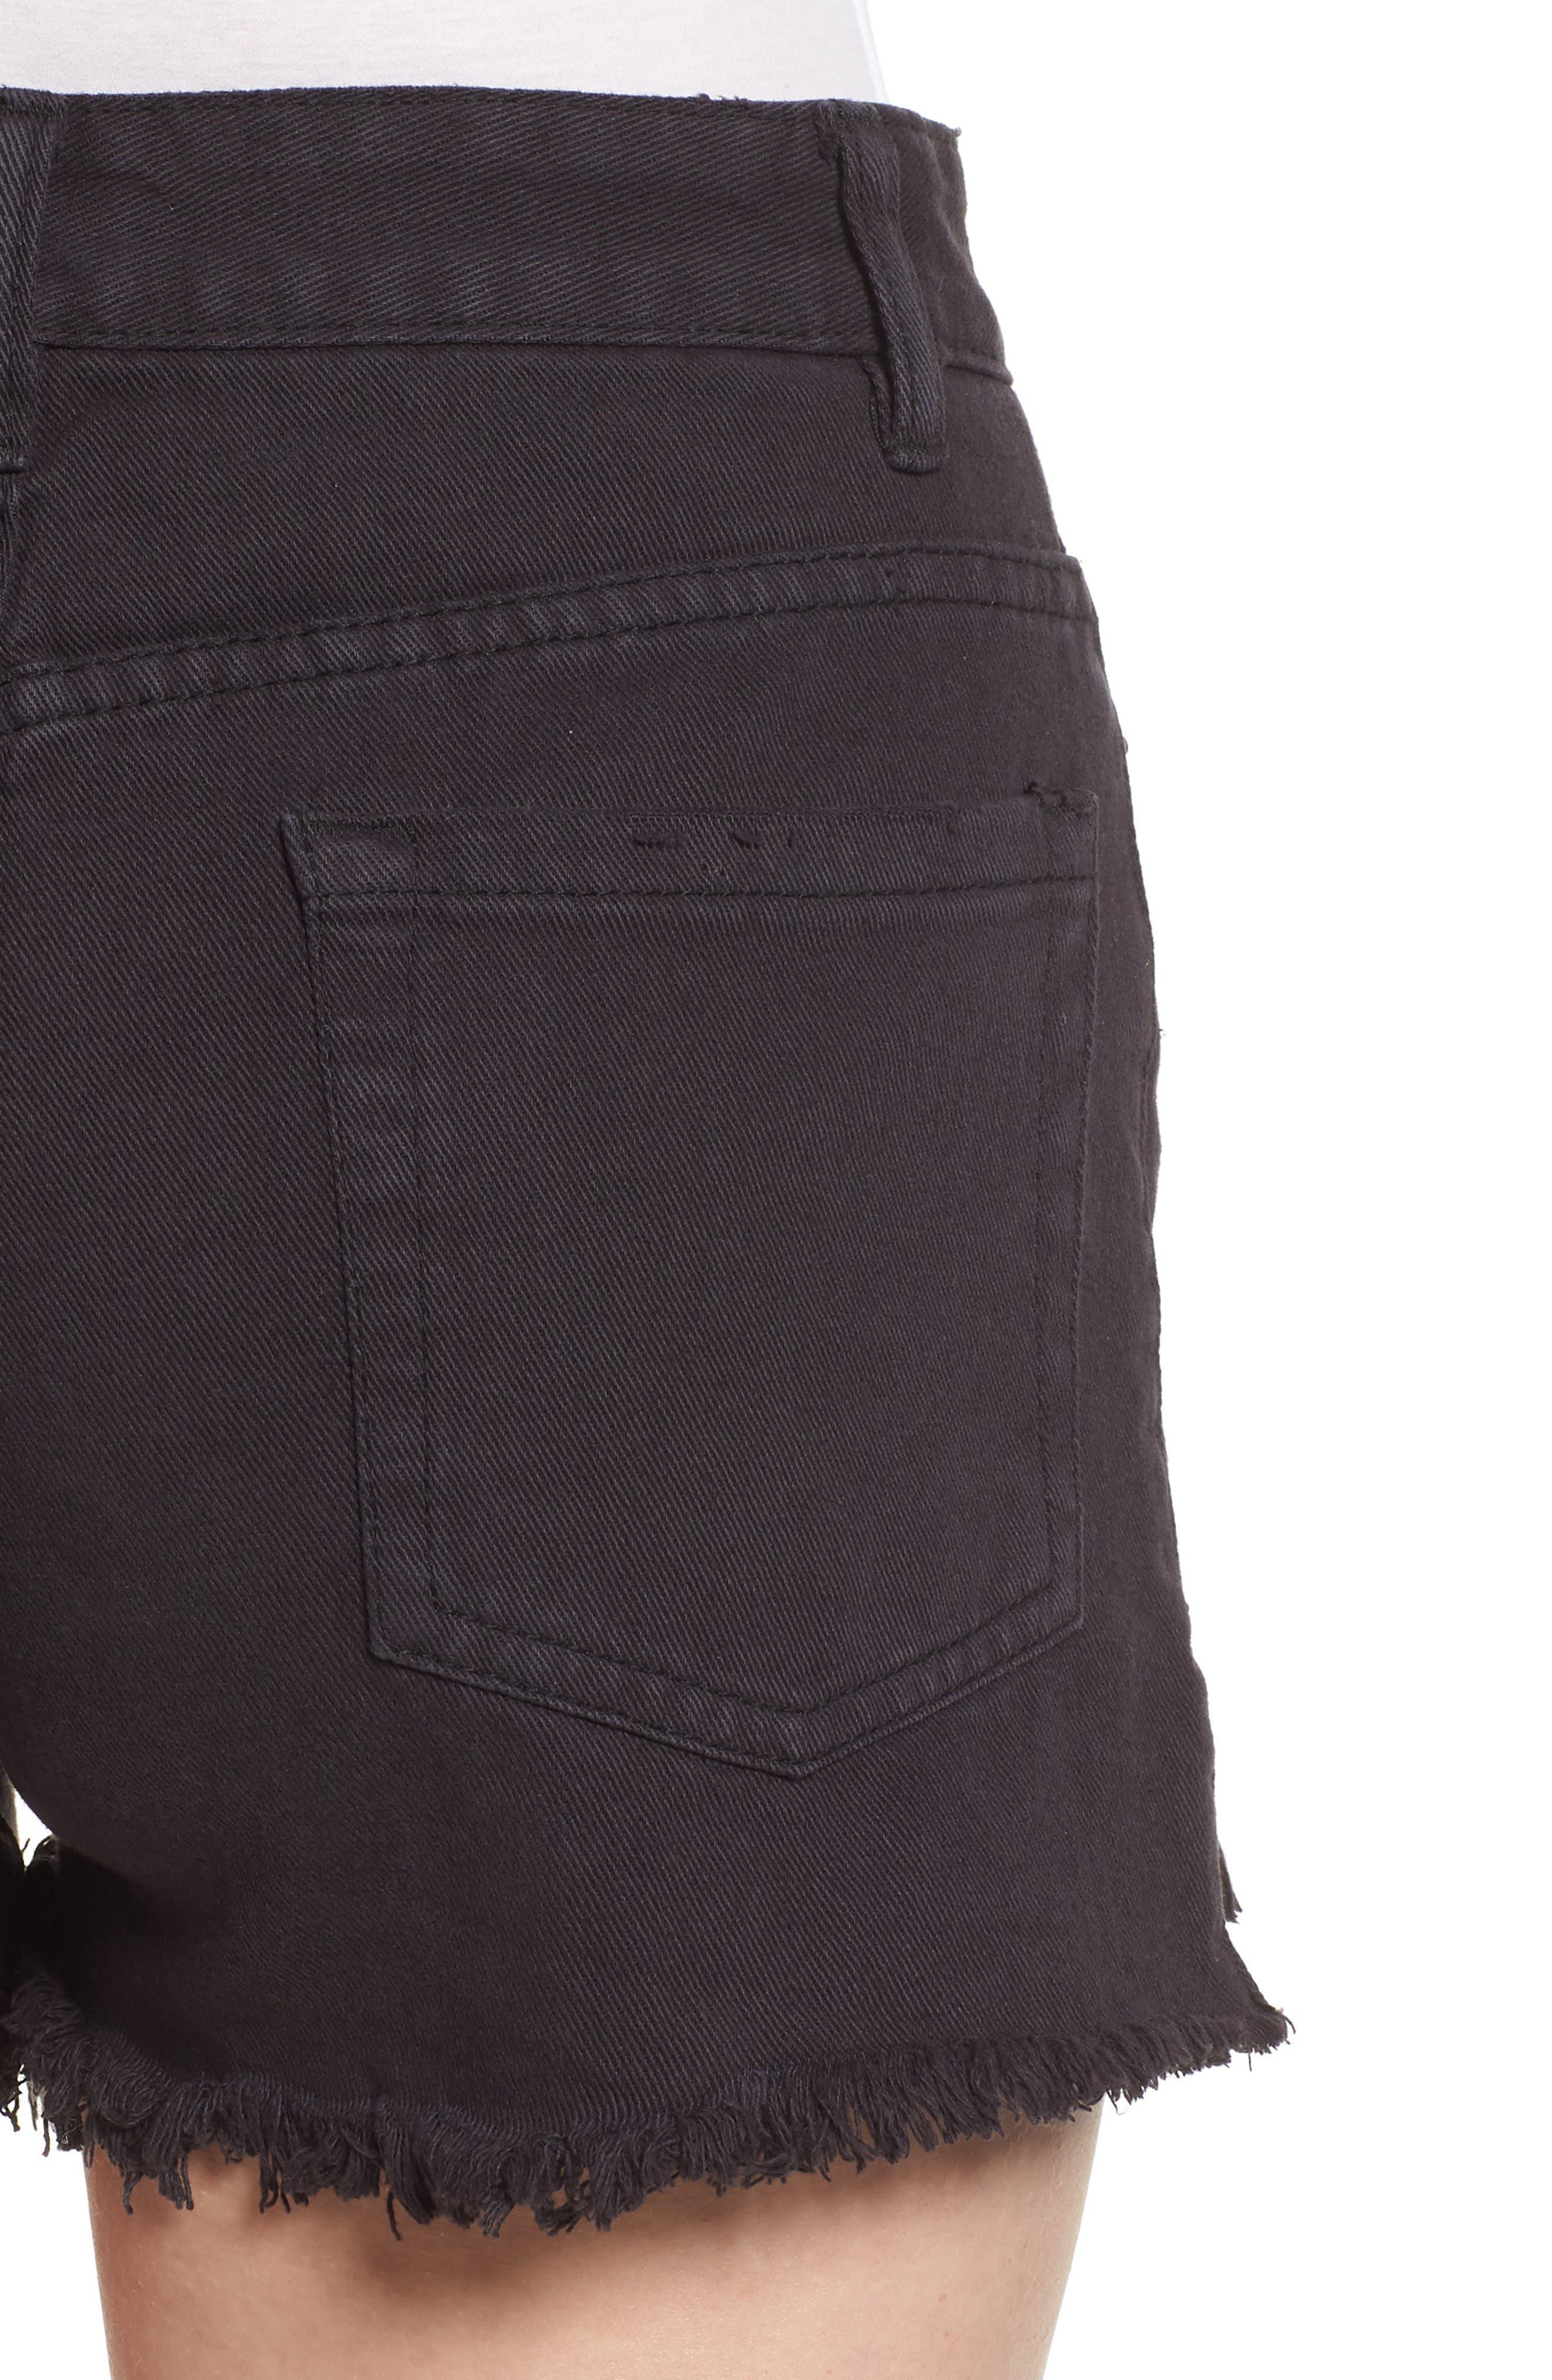 Shoreline Fray Hem Denim Shorts,                             Alternate thumbnail 4, color,                             Black